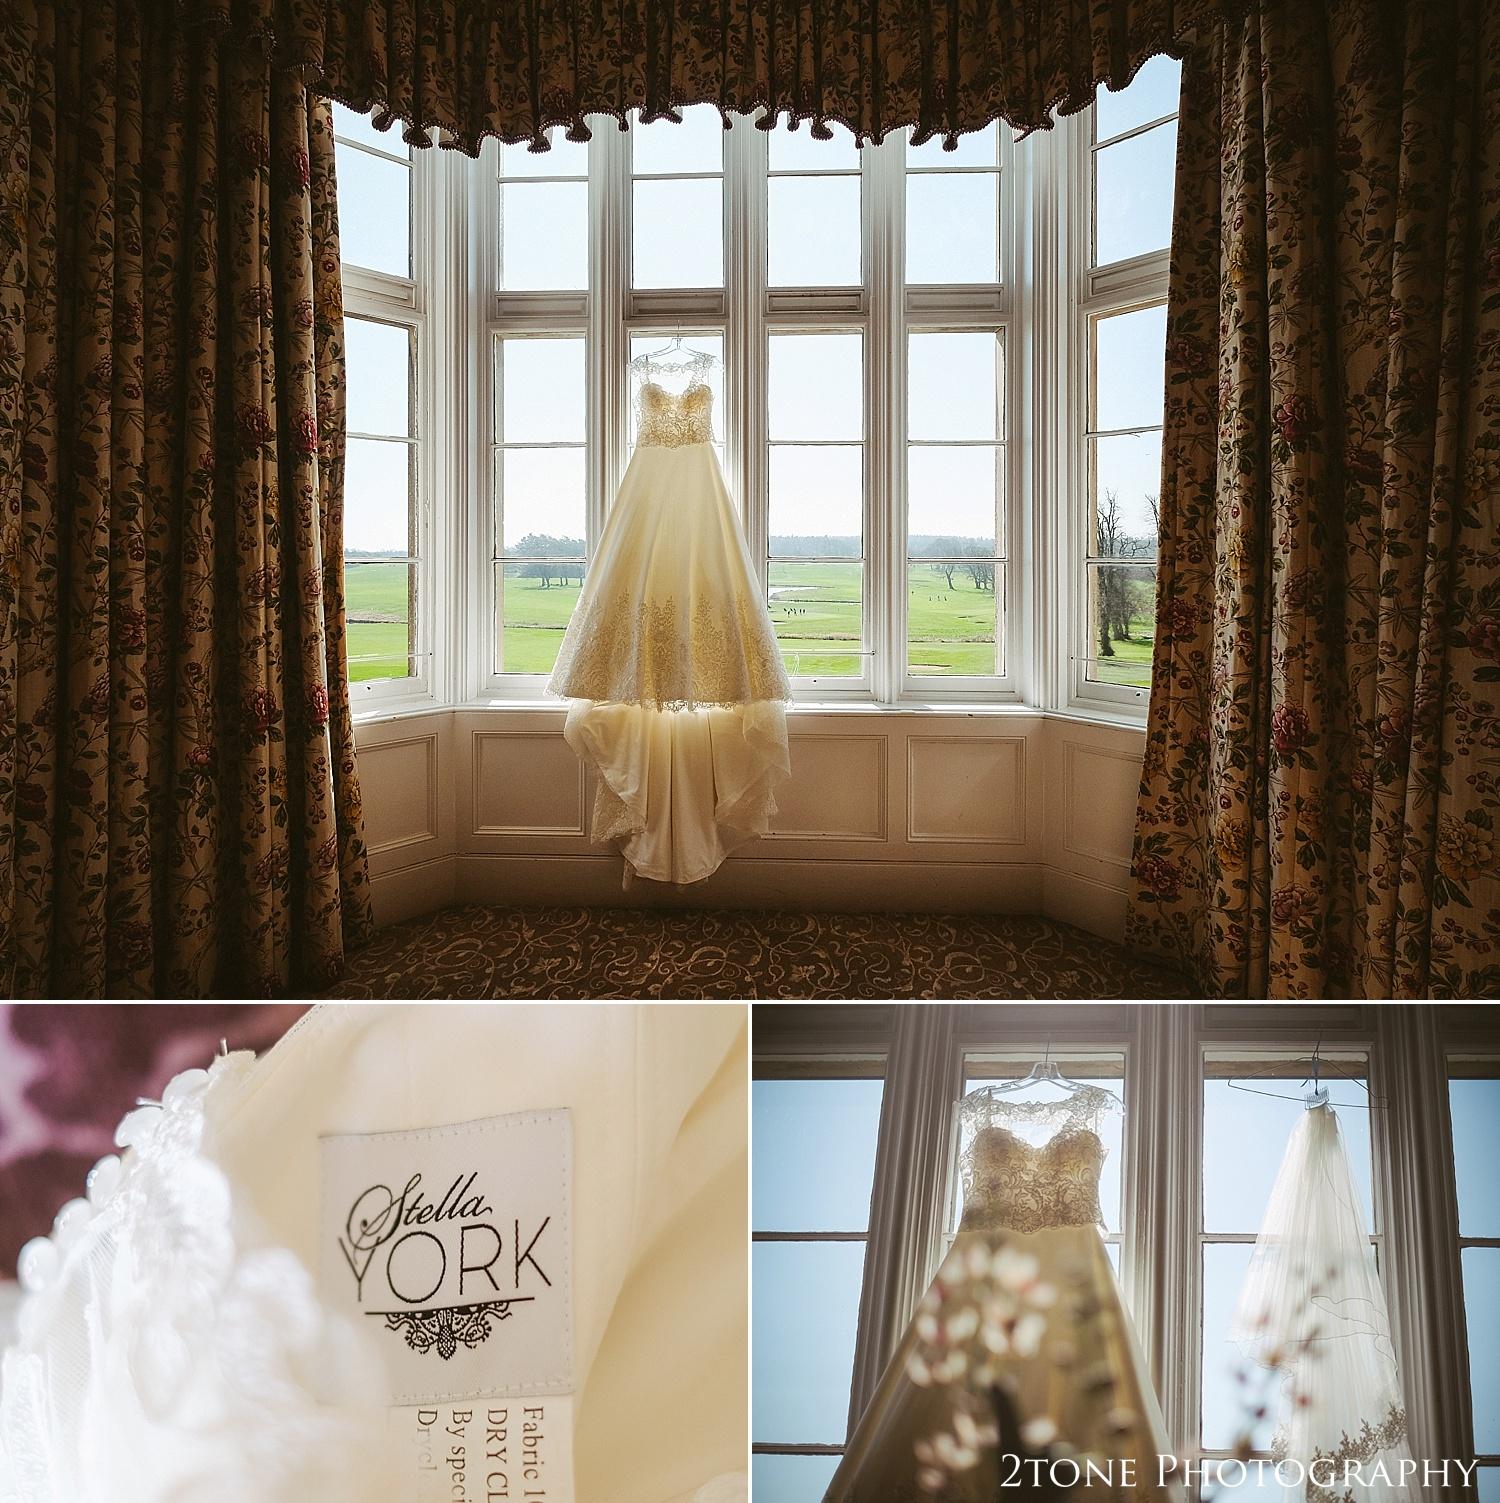 Matfen Hall wedding dress